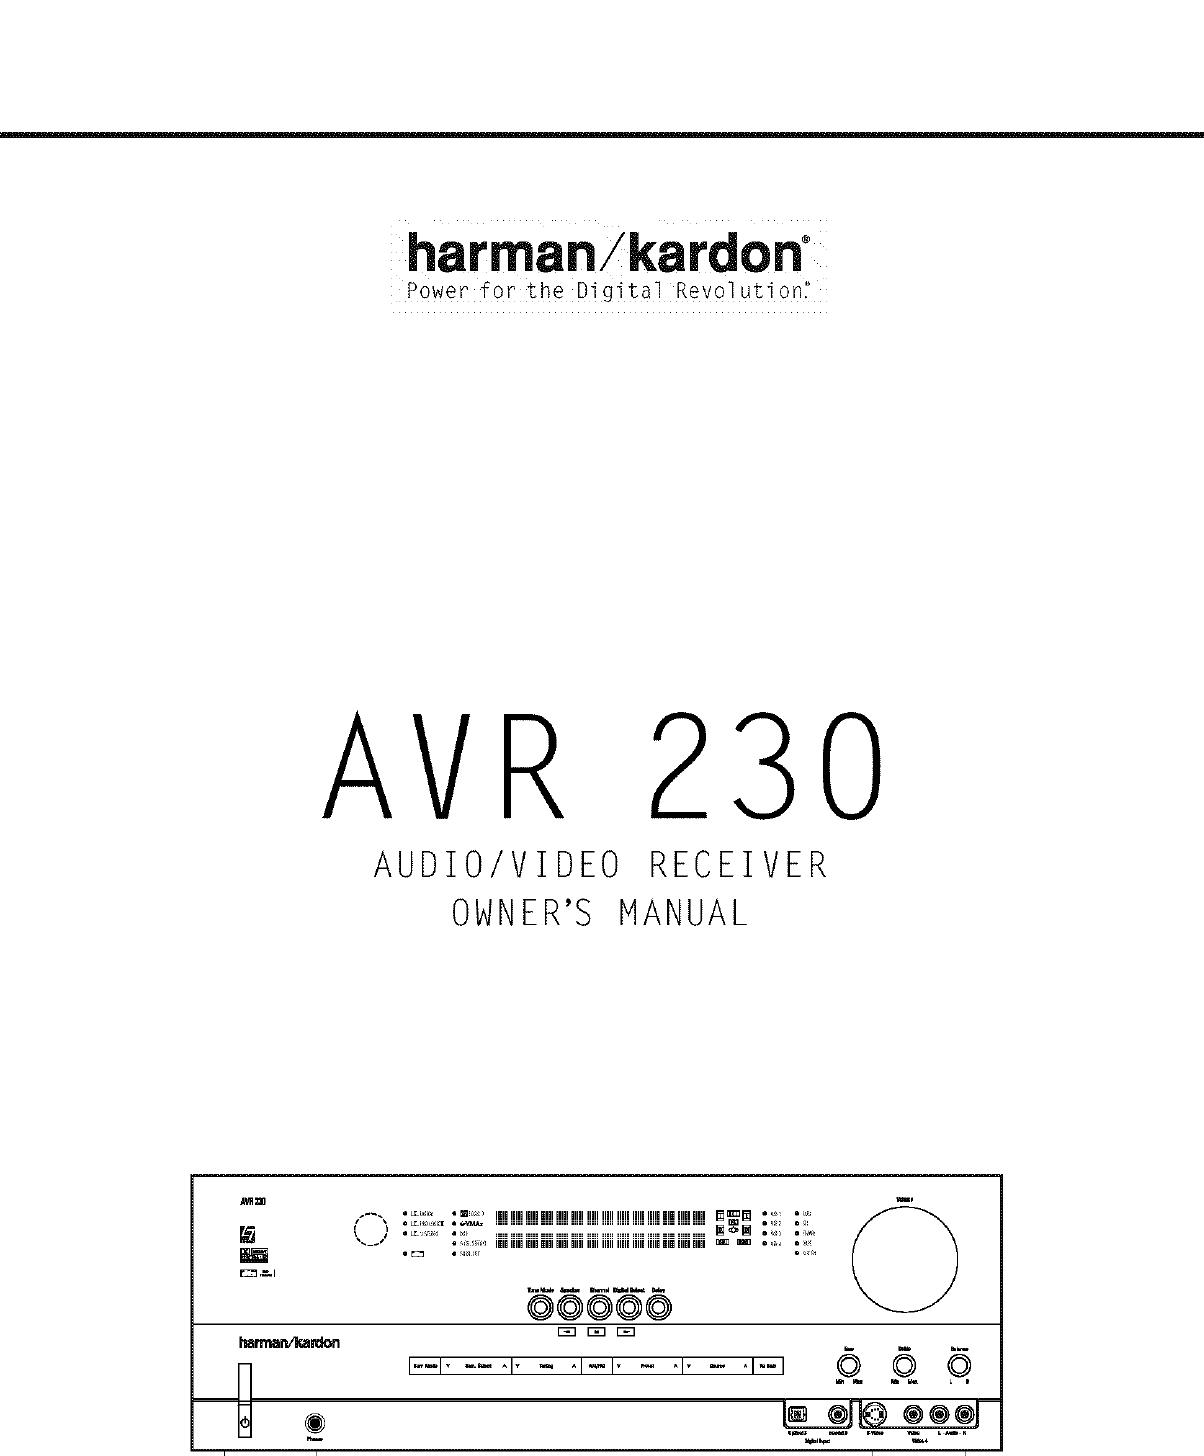 ... Array - hitachi kc320 manual ebook rh hitachi kc320 manual ebook ballew  us